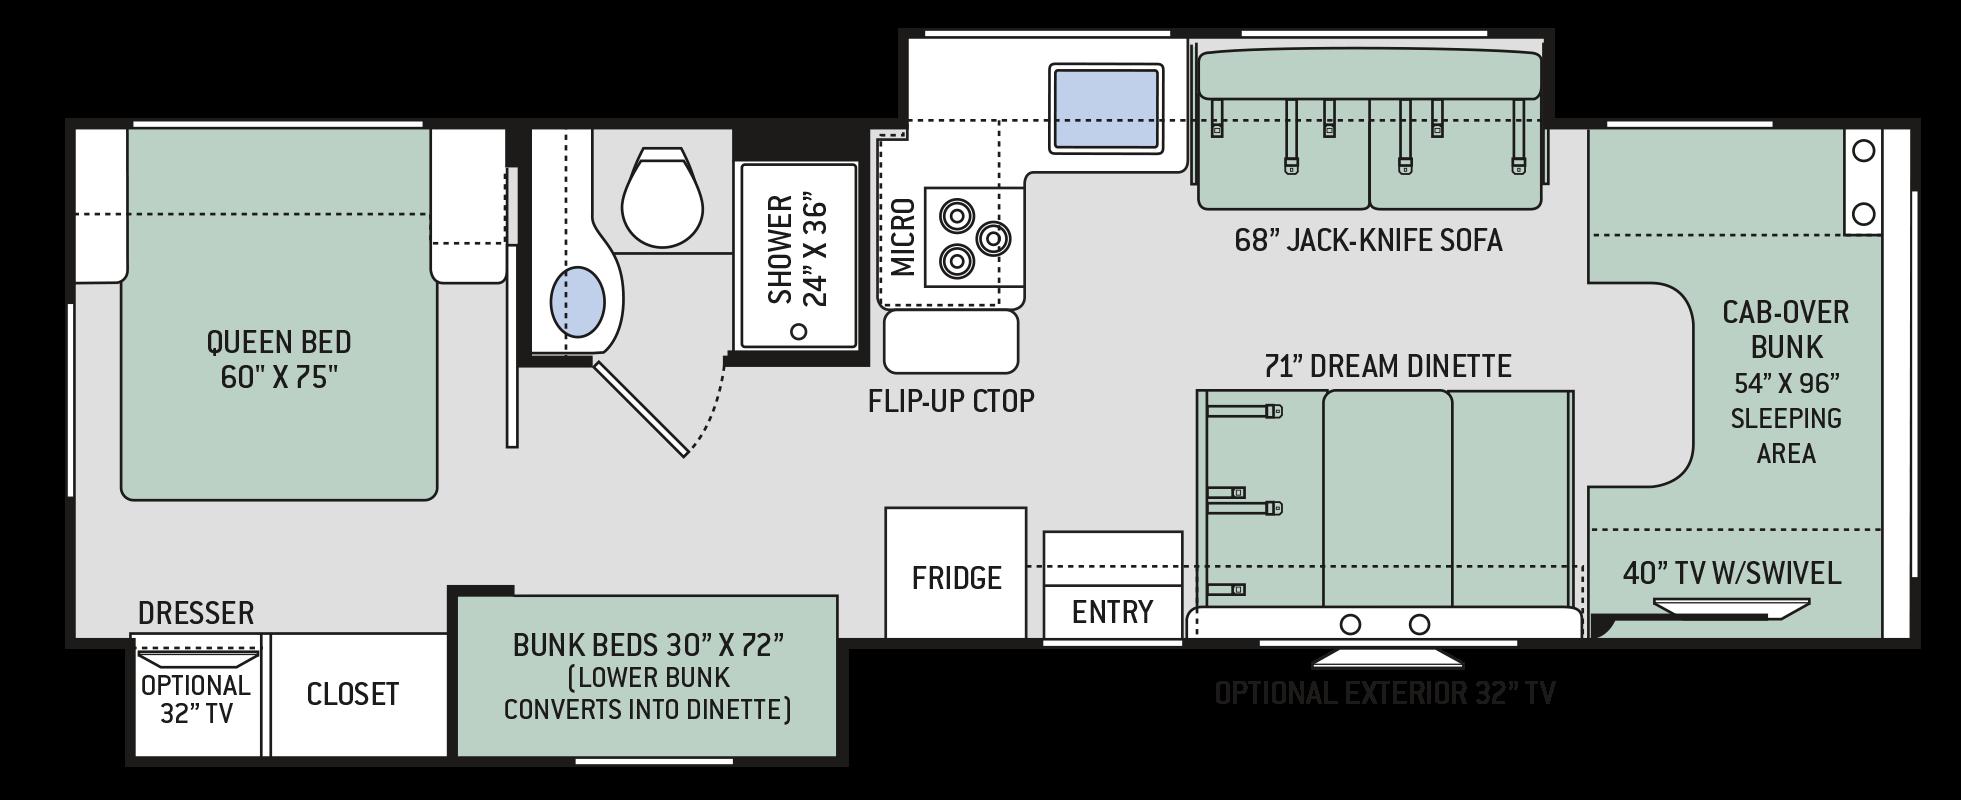 Chateau Class C Motorhomes - Floor Plan: 30D